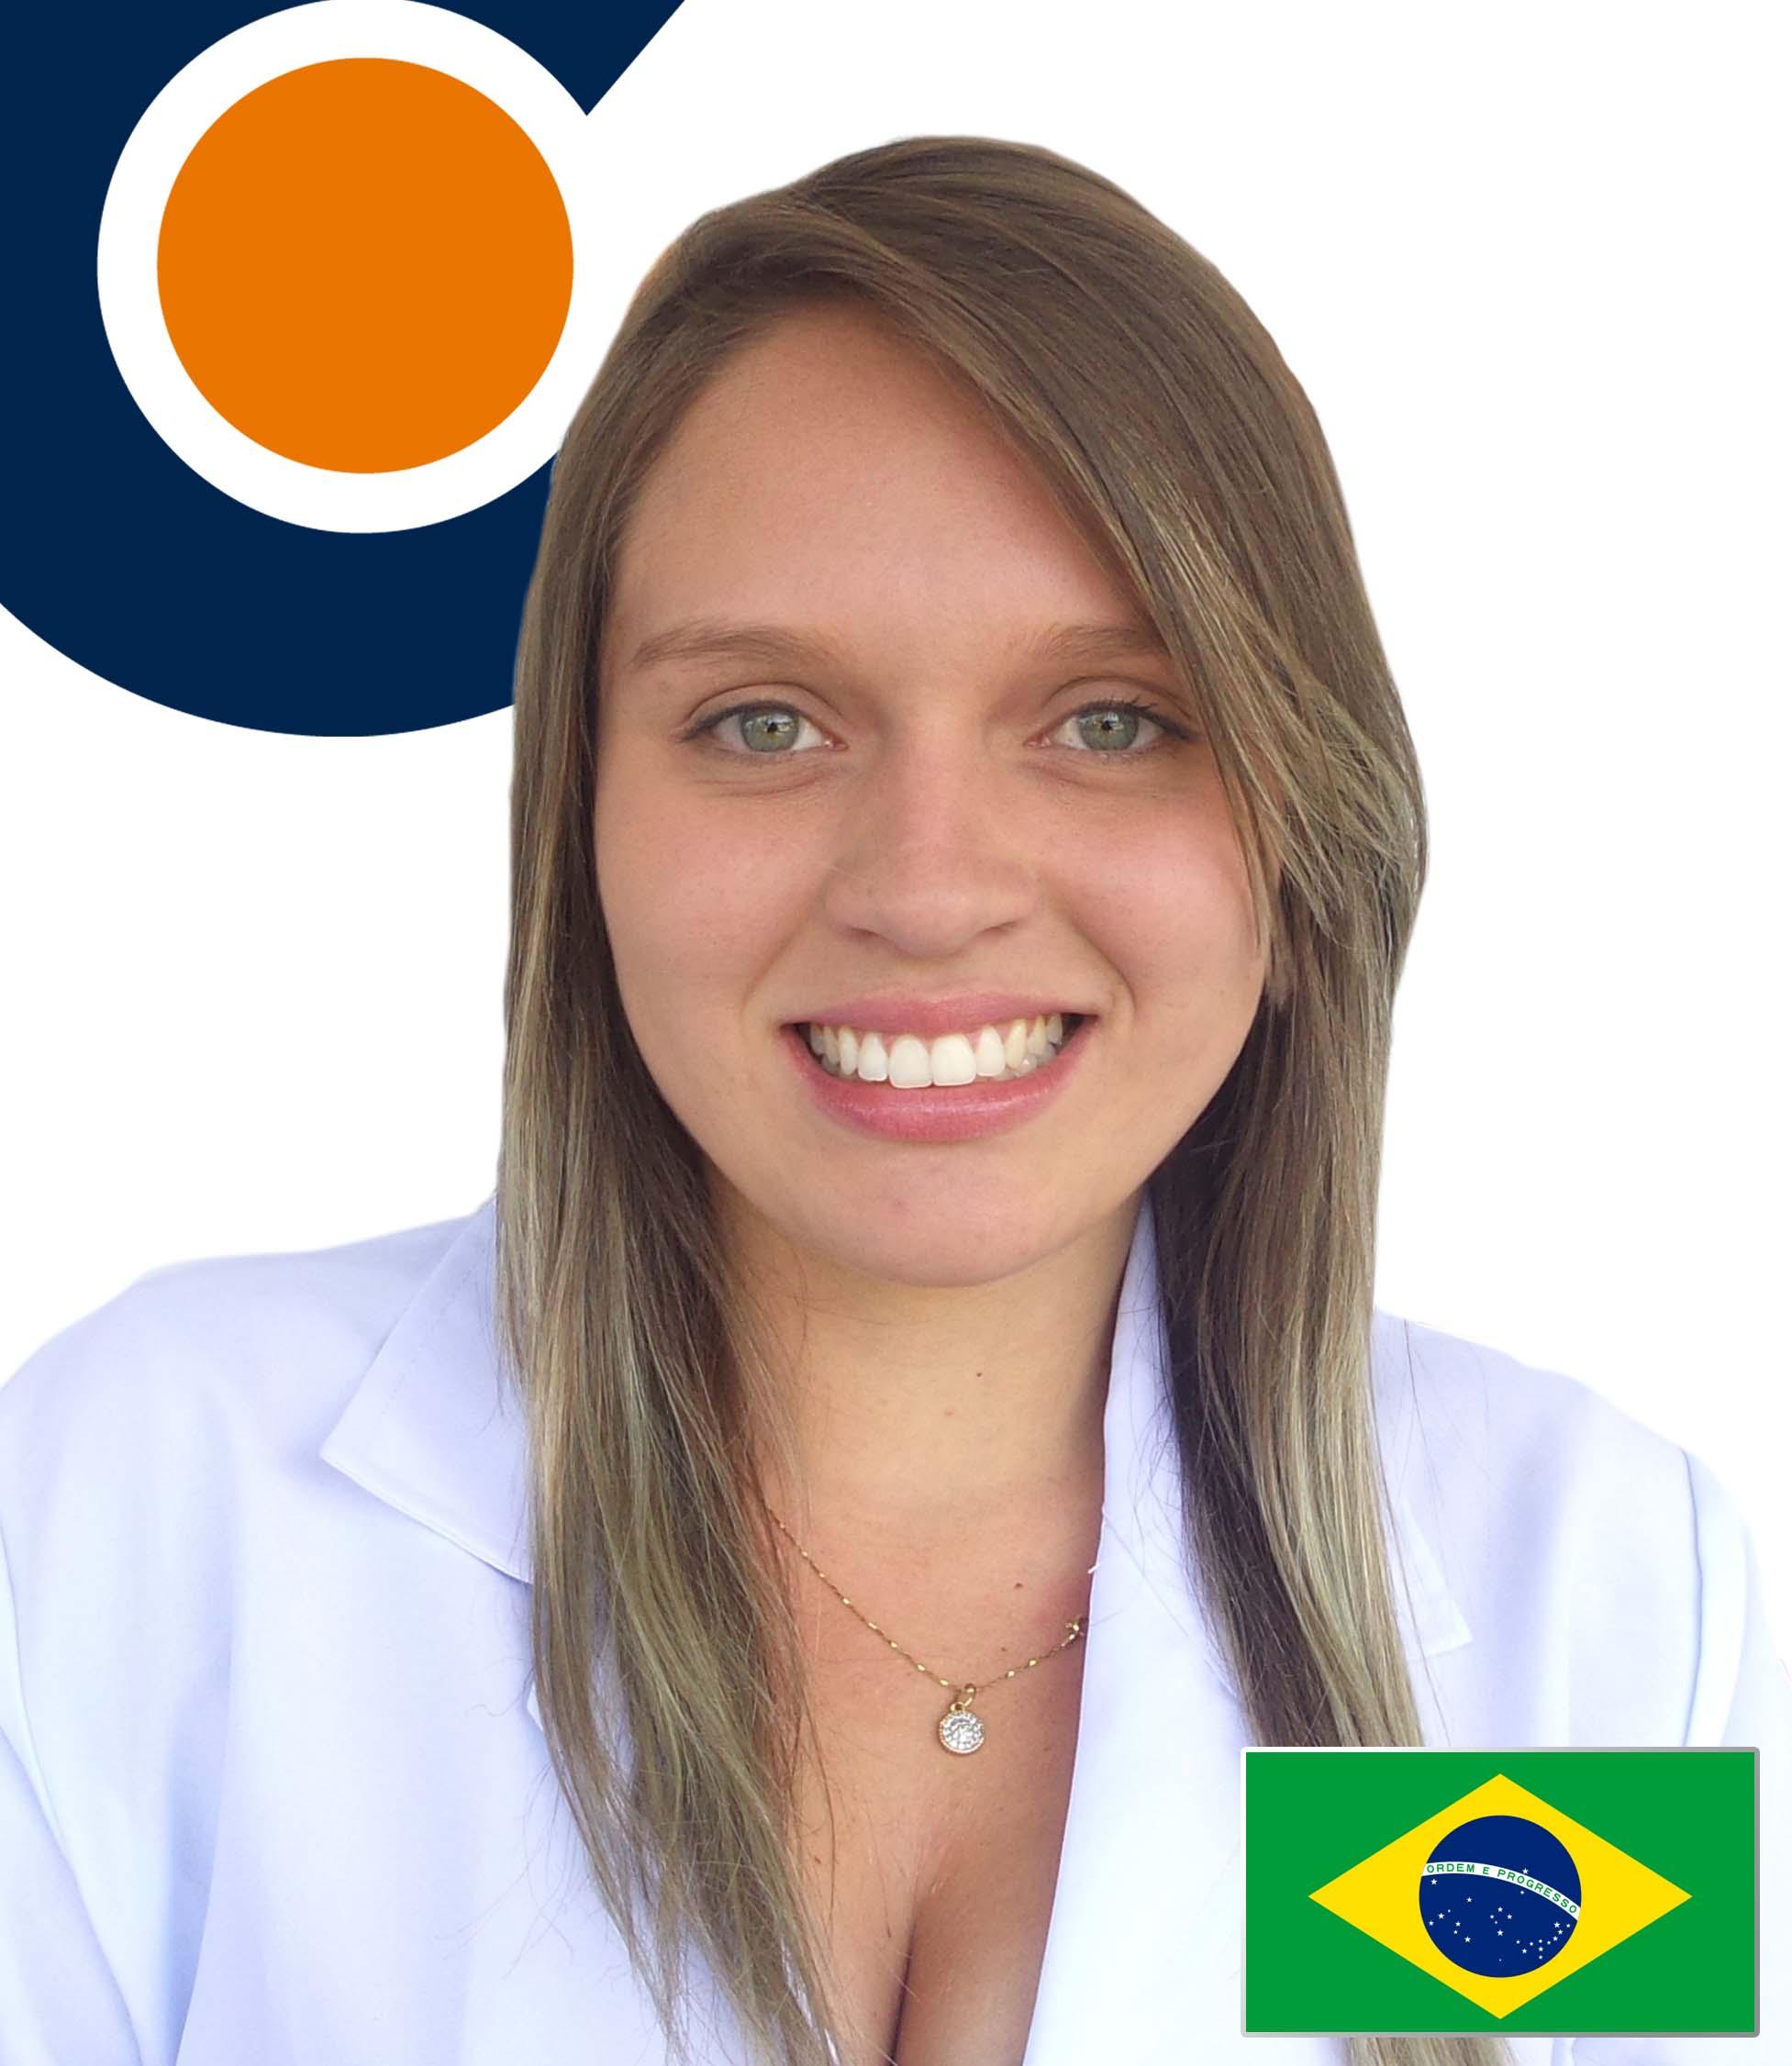 TAINARA ANI DE OLIVEIRA